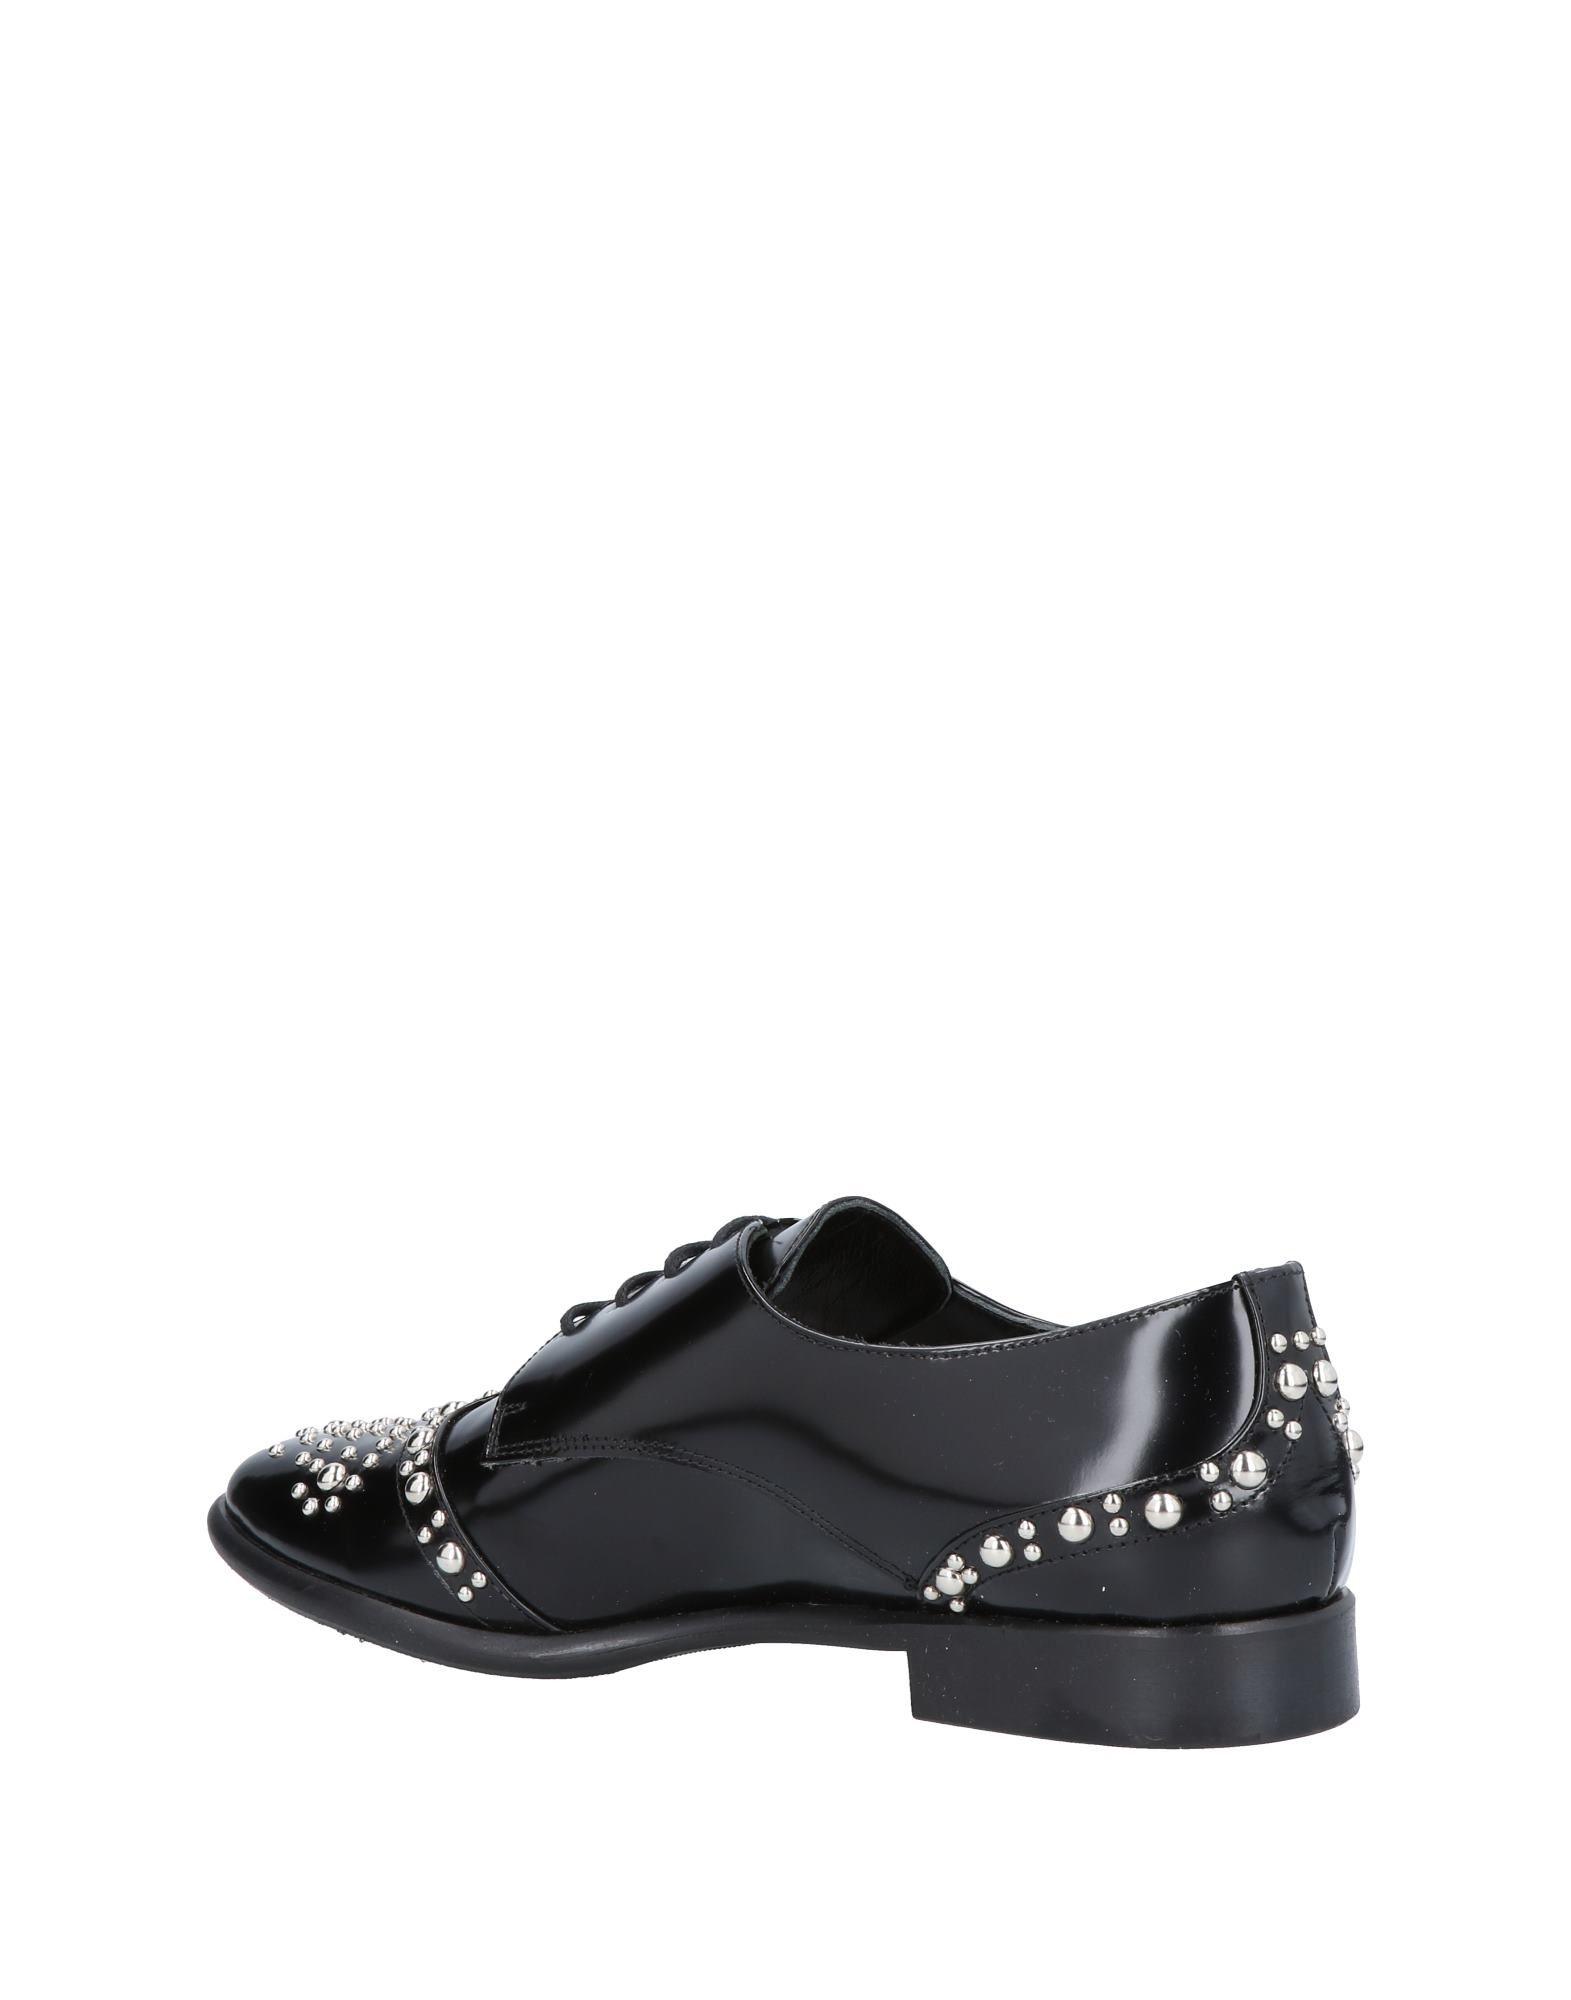 Anna F. Schnürschuhe Damen  11480366SR Gute Qualität beliebte Schuhe